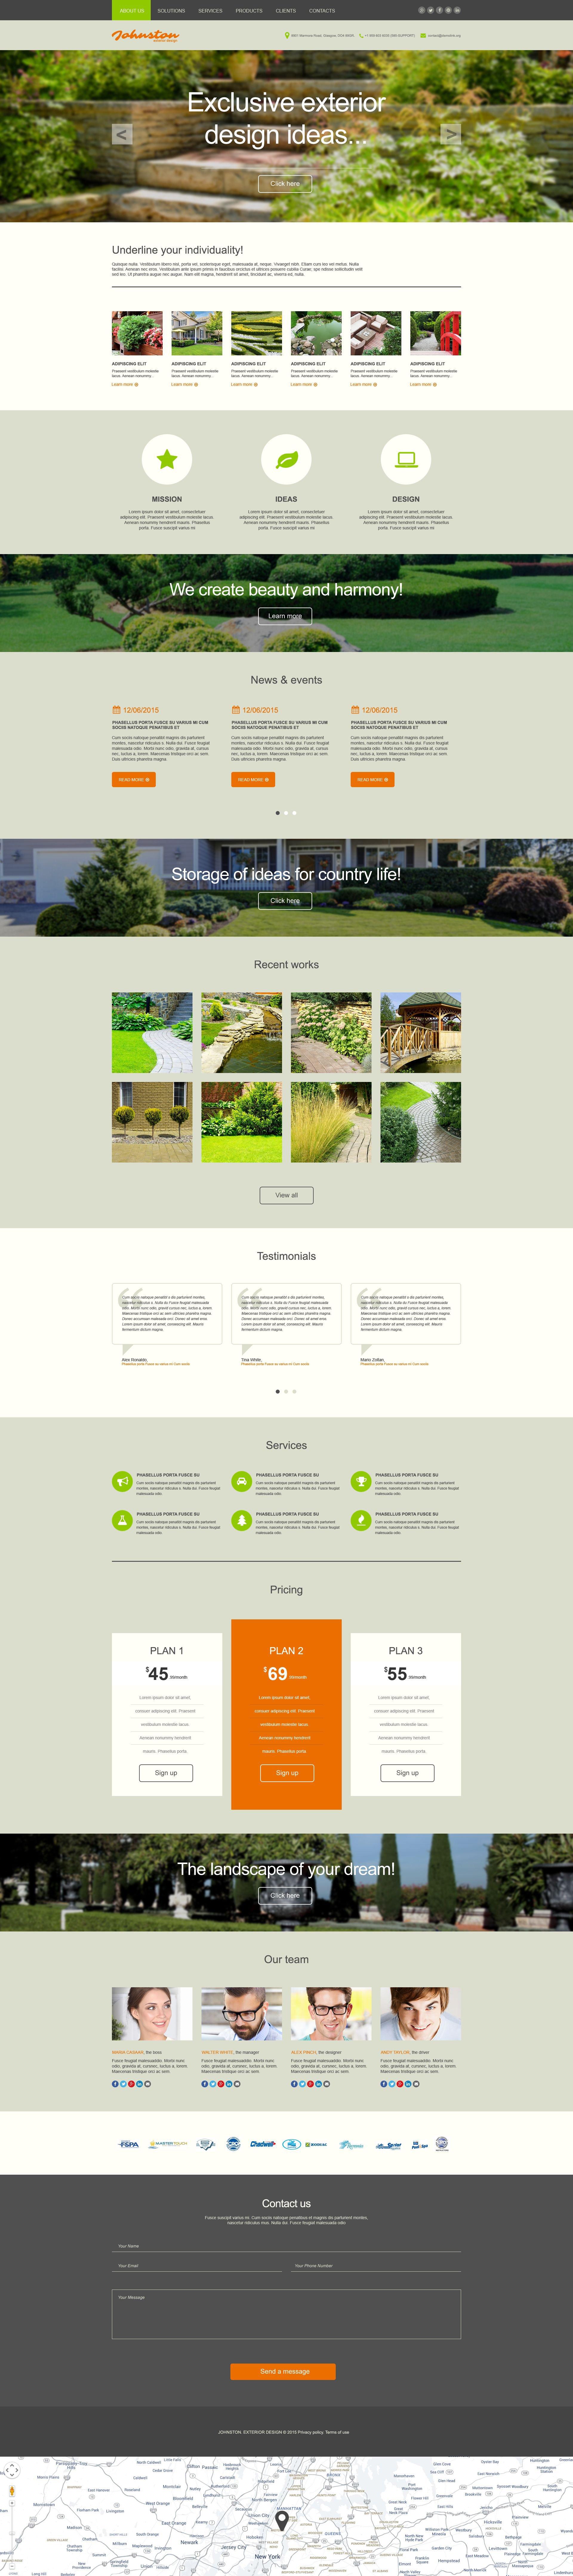 Muse šablona Design exteriéru #53338